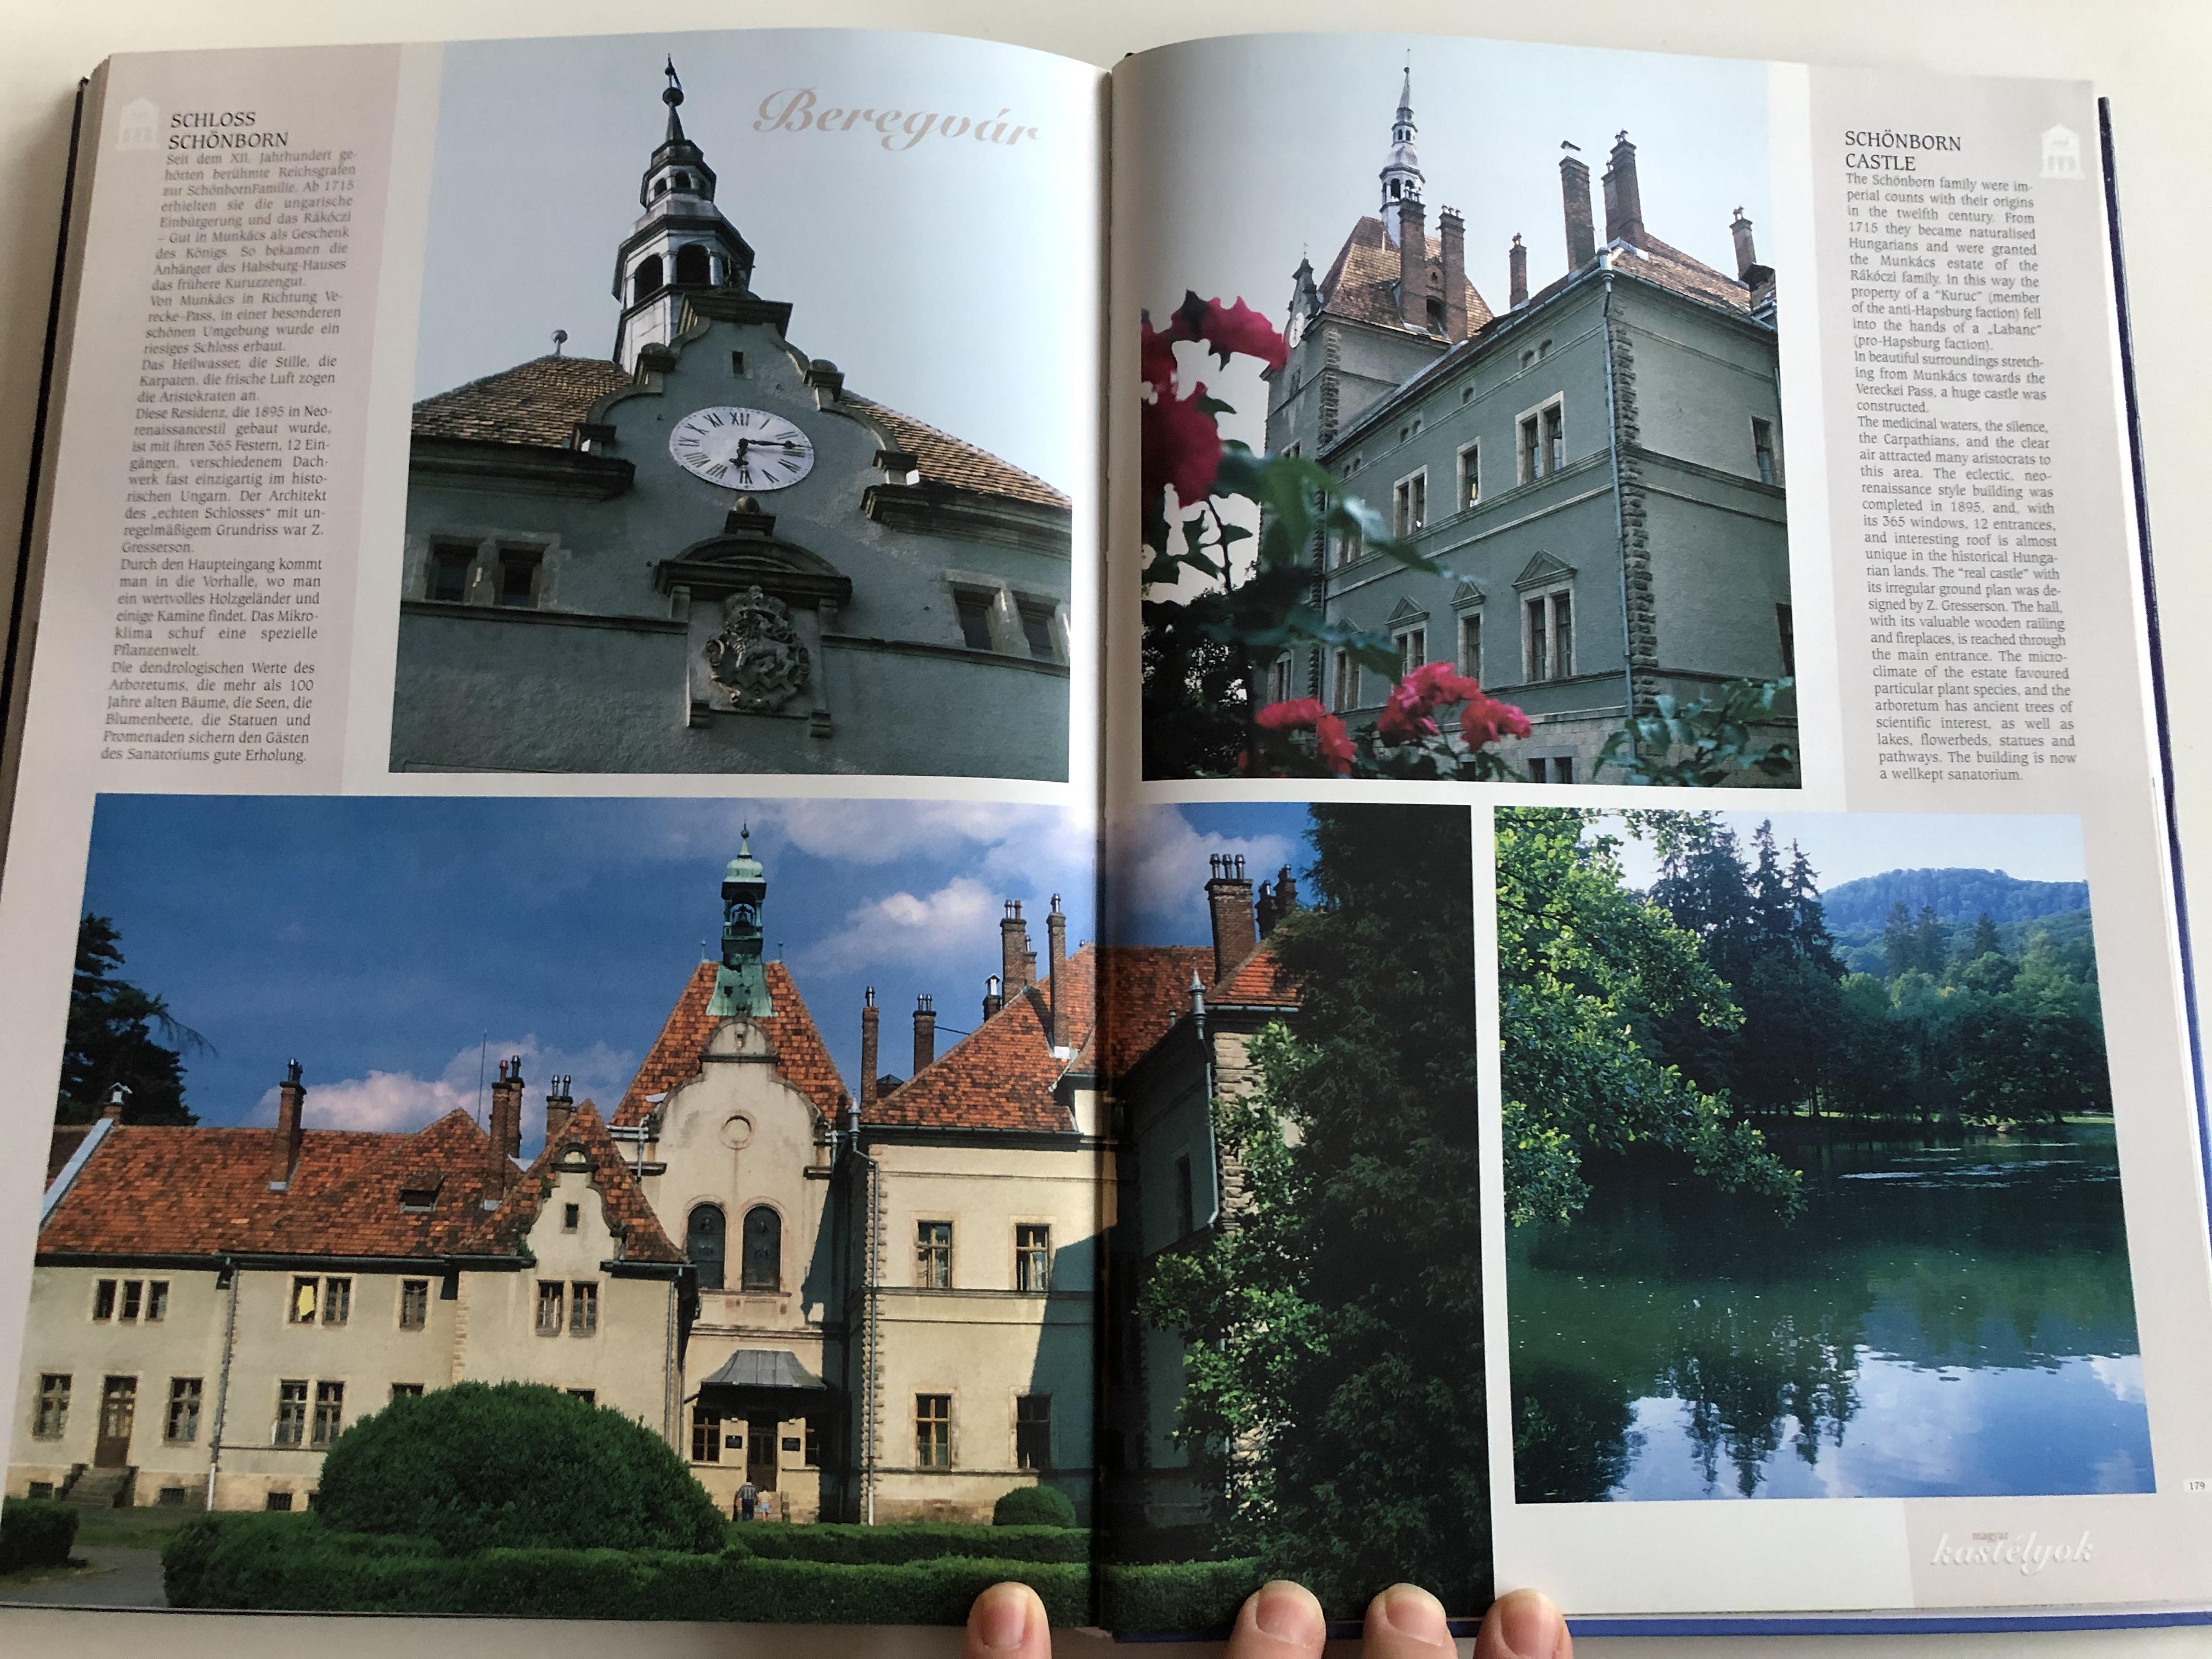 magyar-kast-lyok-by-bagyinski-zolt-n-one-hundred-hungarian-castles-and-mansions-16.jpg